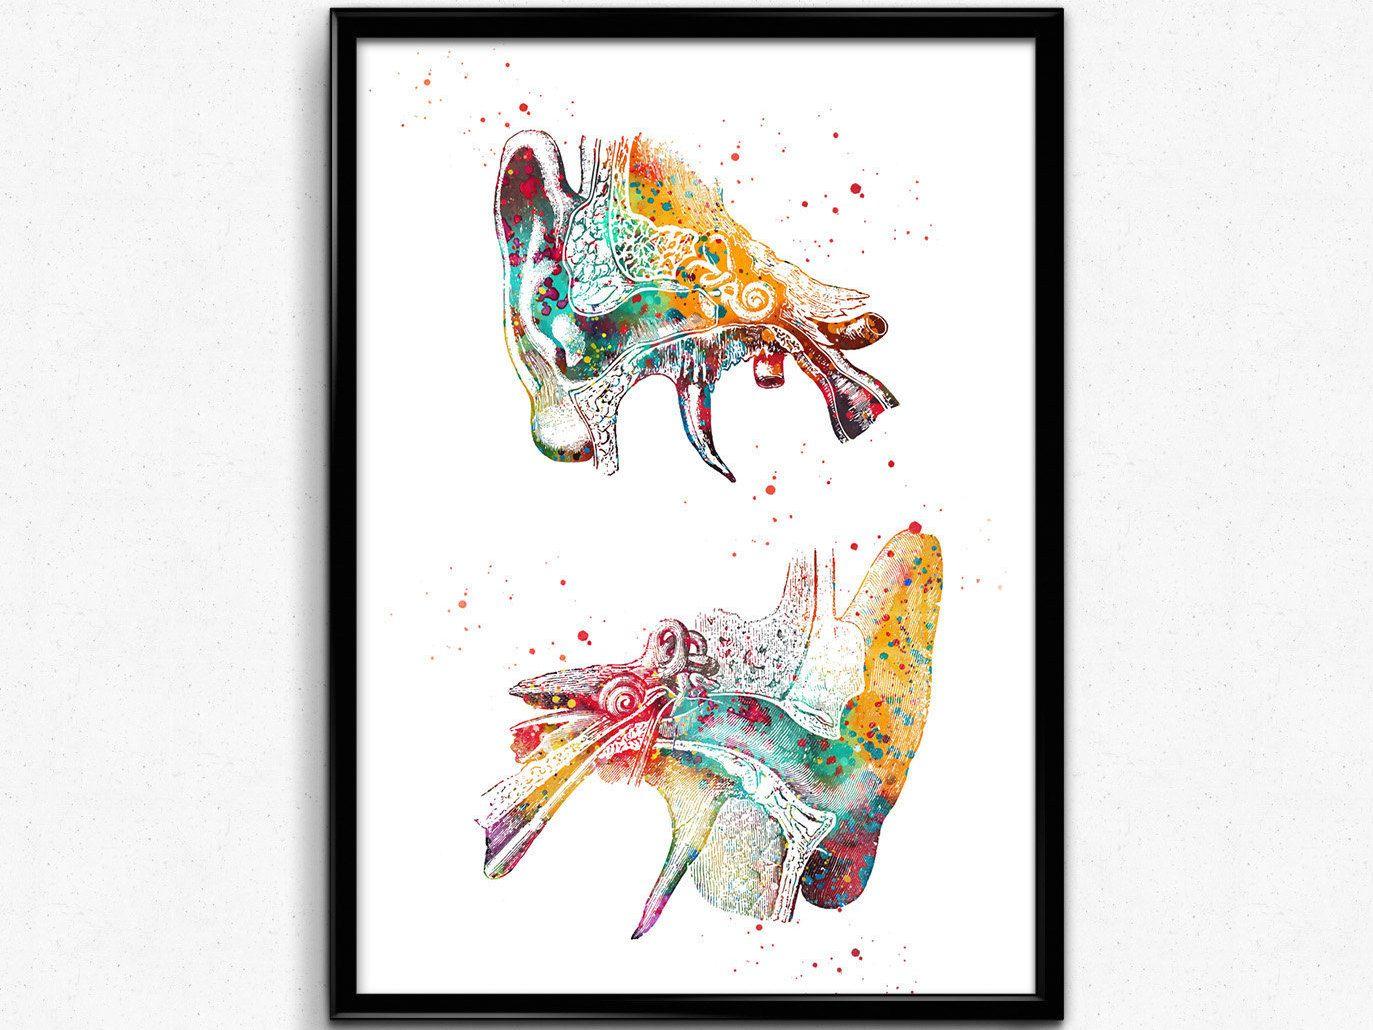 Human Ear Outer Ear Anatomy Watercolor Print Audiology